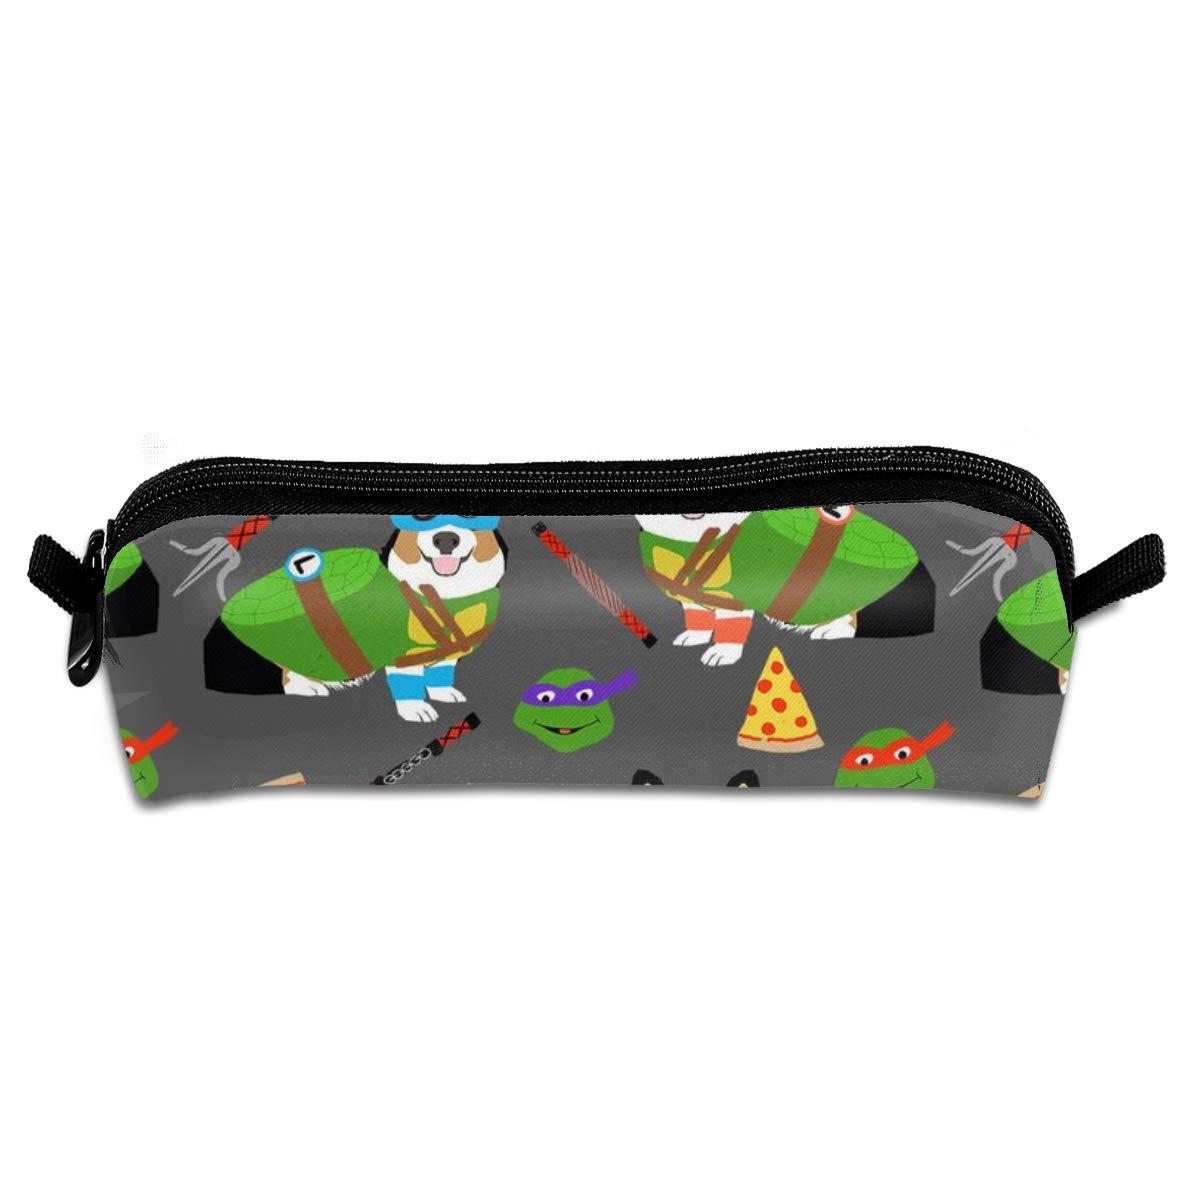 Tri Corgi Ninja Turtle - Dog, Dogs, Cartoon, Costu Pencil ...